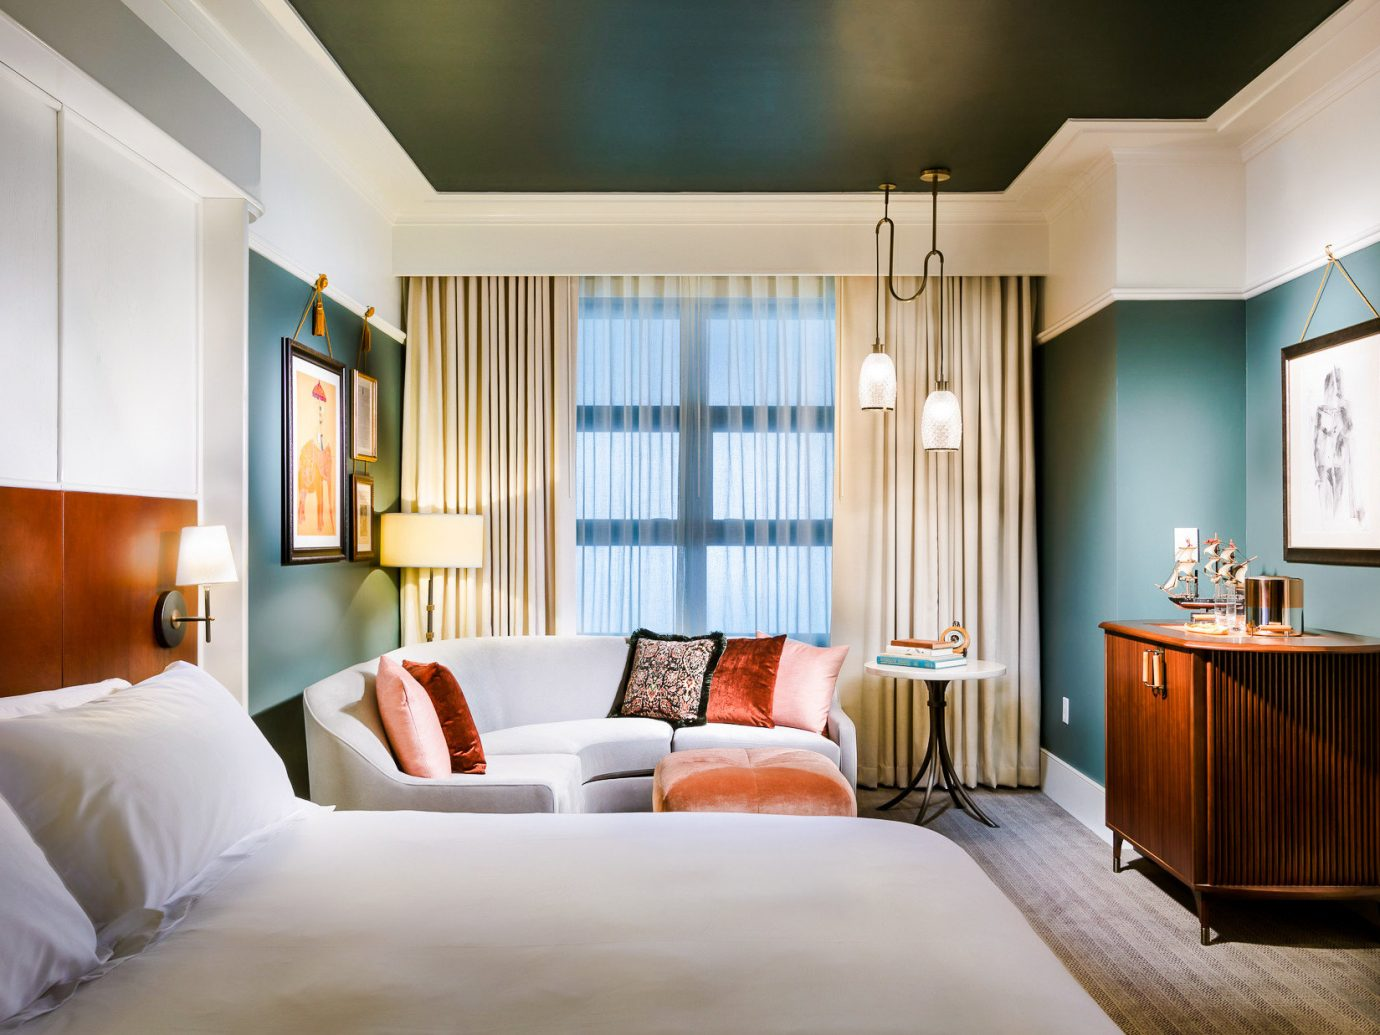 Perry Lane Hotel, Savannah, Georgia